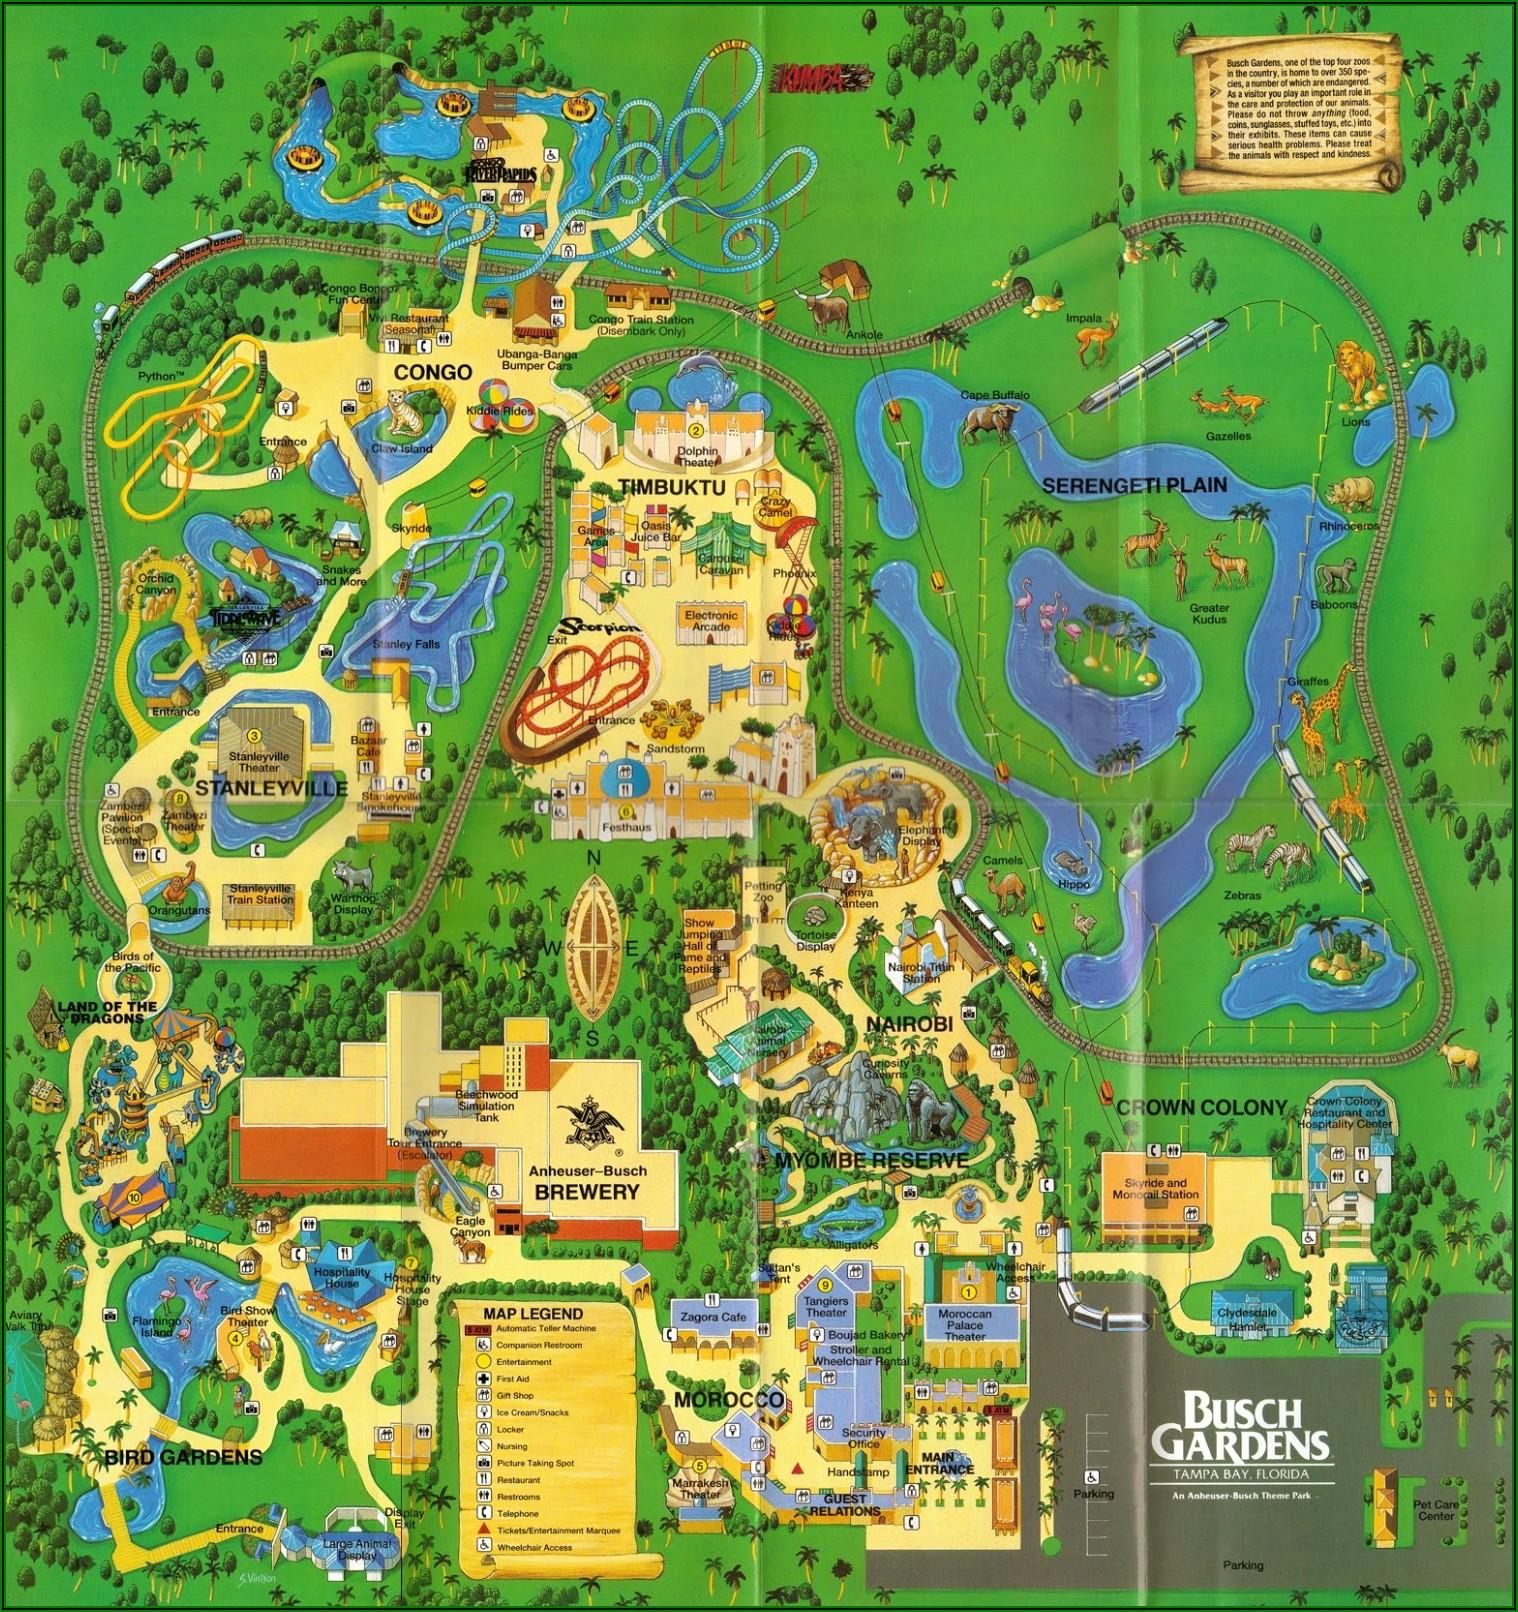 Busch Gardens Tampa Park Map 2020